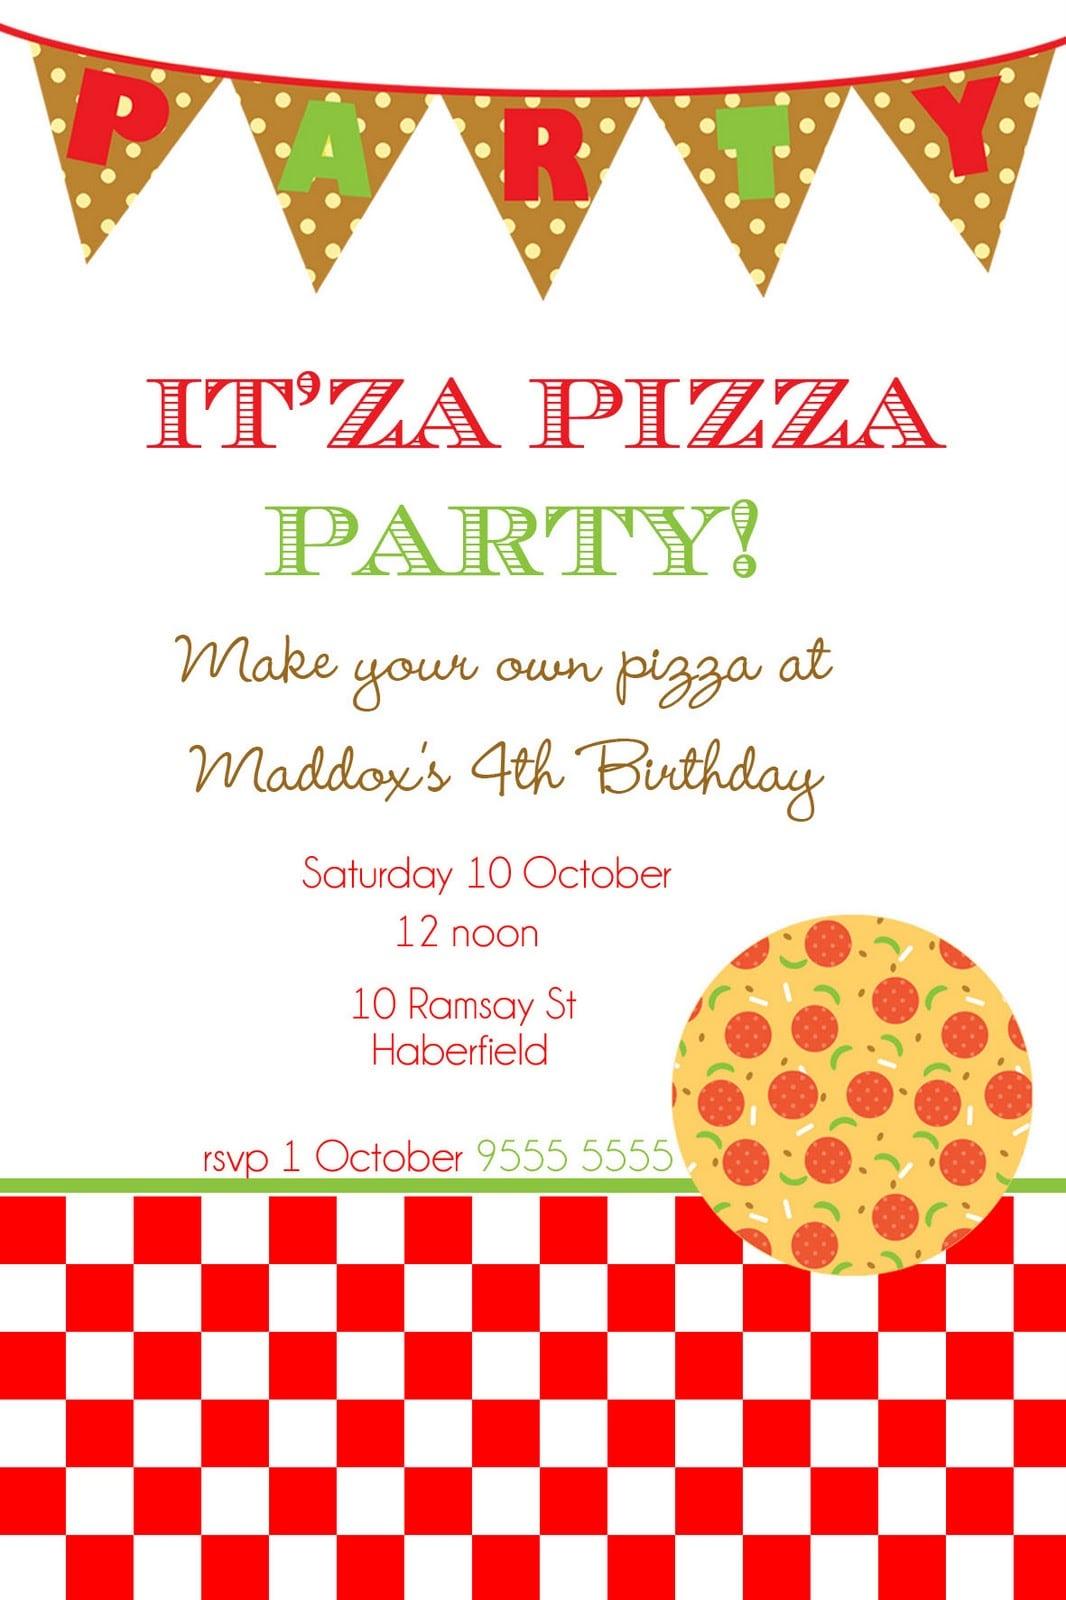 Mon Tresor  It'sa Pizza Party!